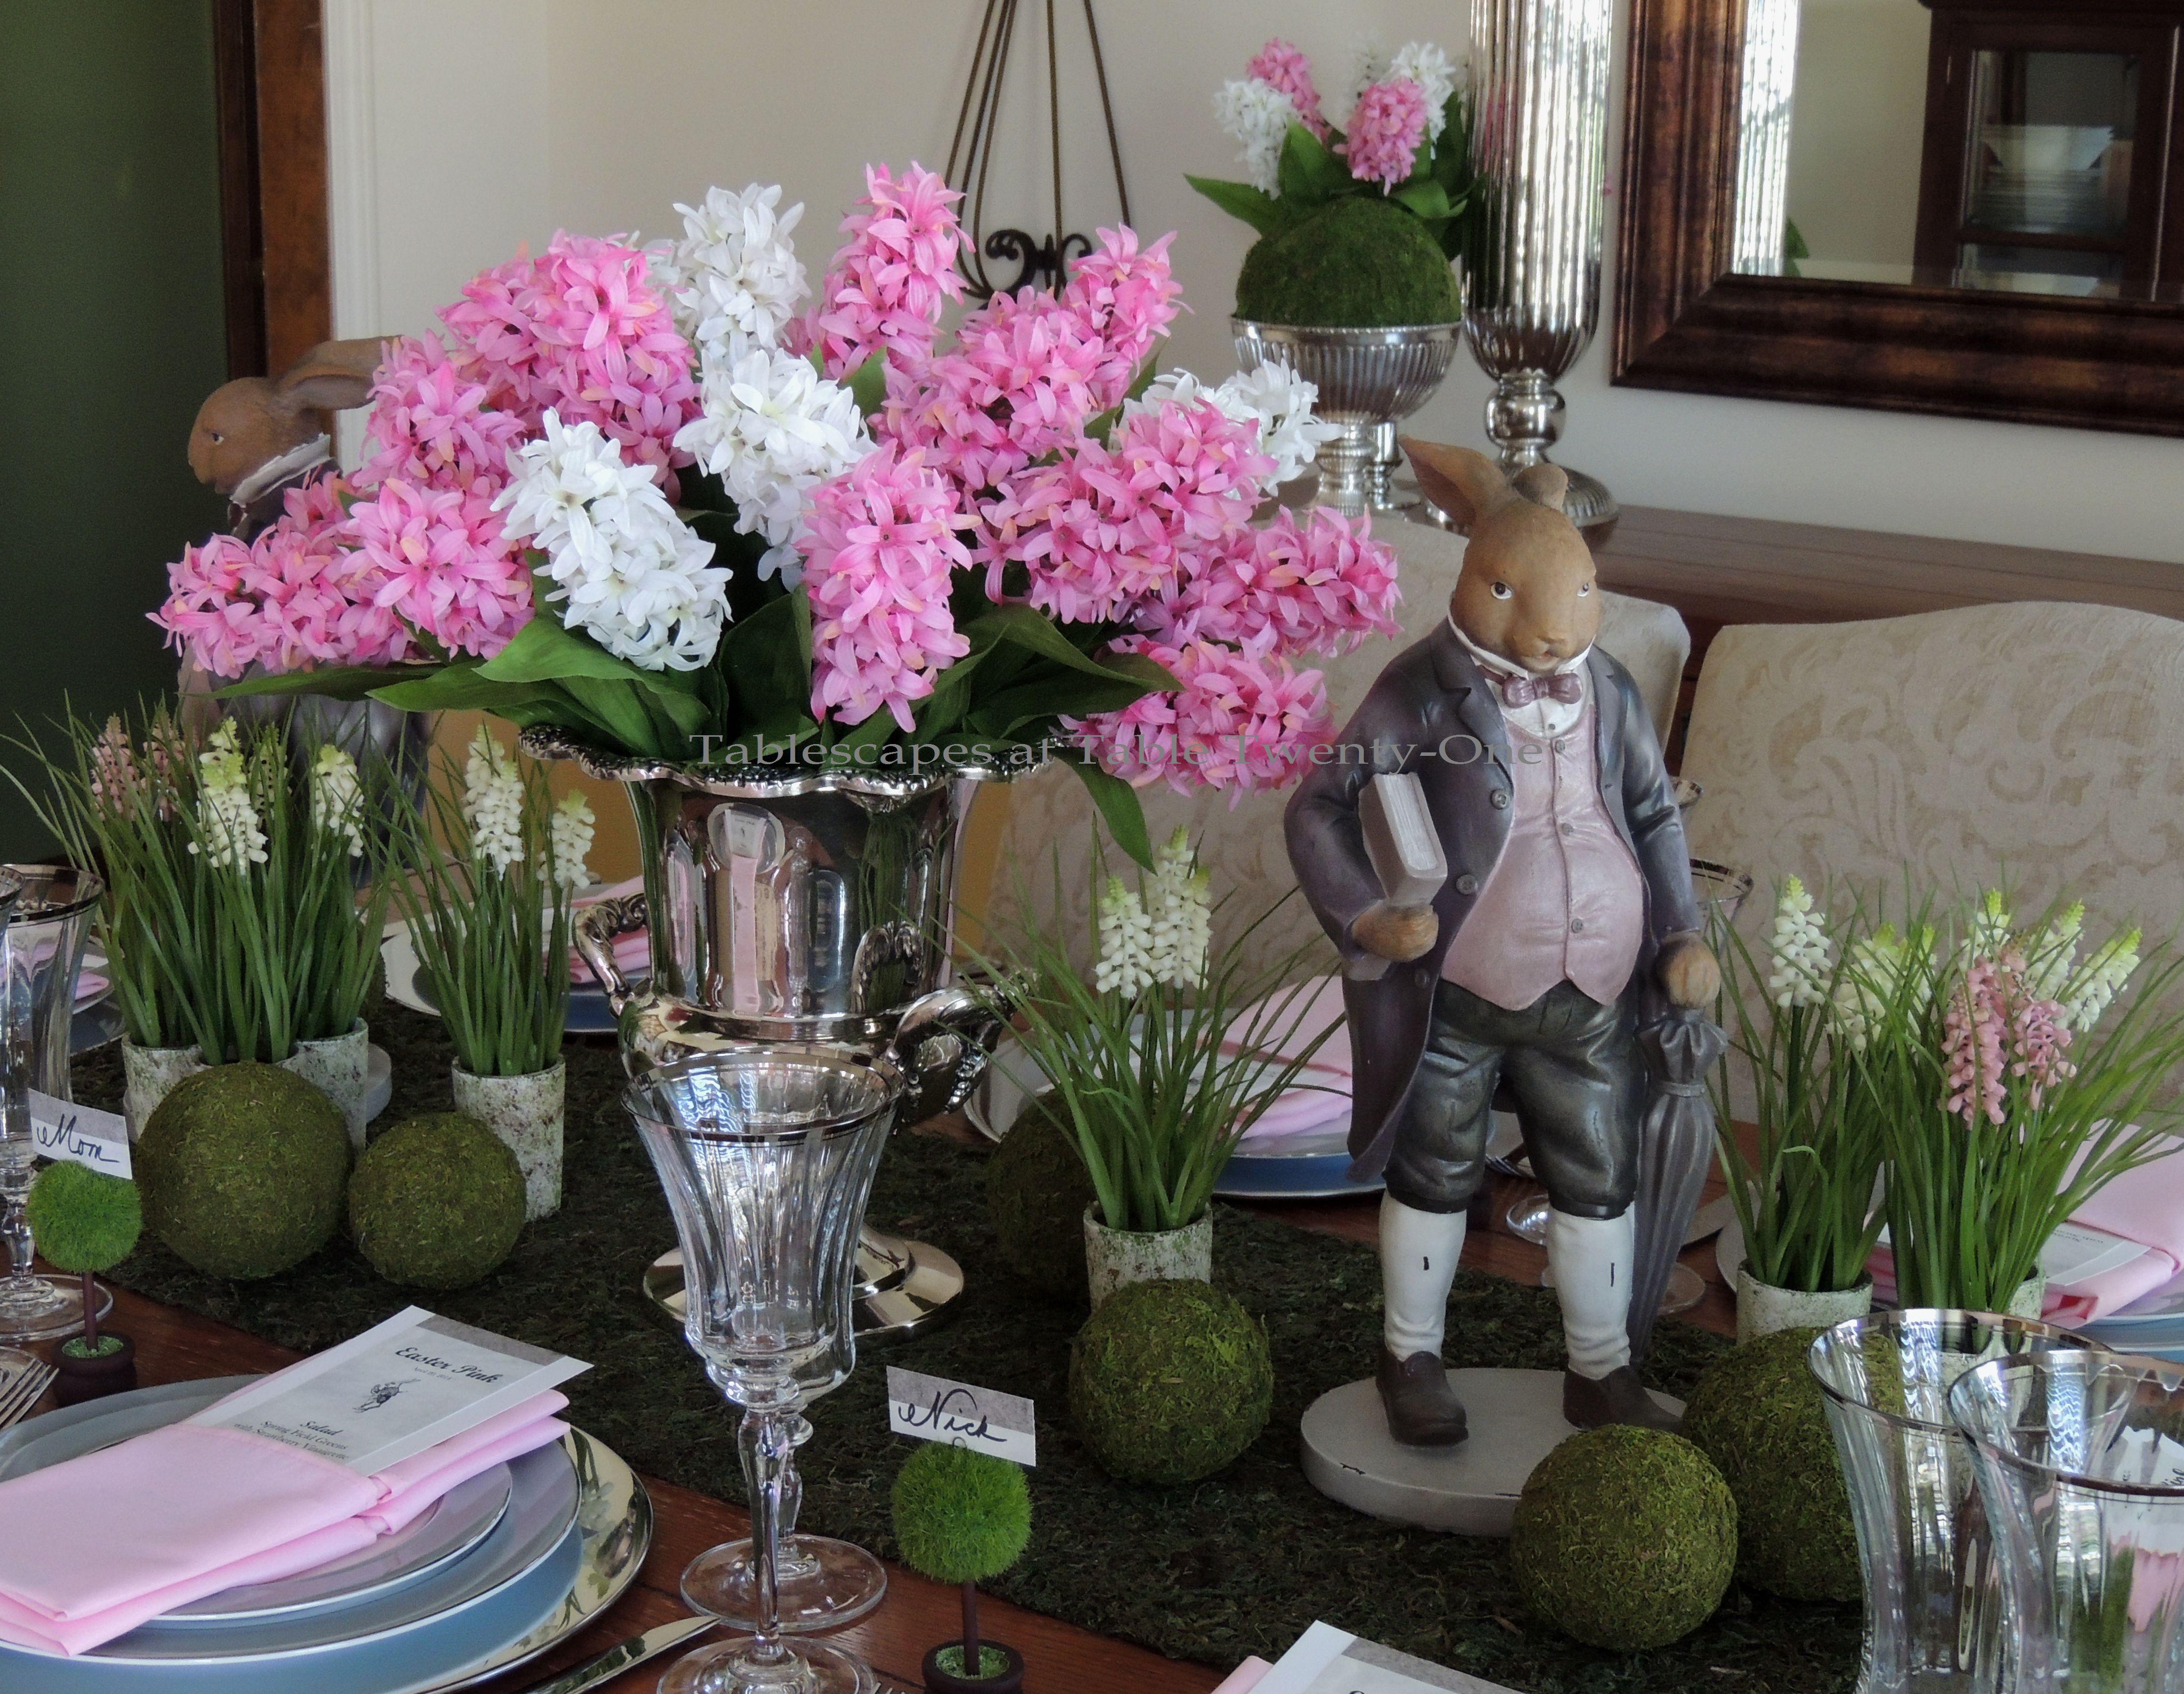 Tablescapes at Table Twenty-One, www.tabletwentyone.wordpress.com - Easter in Pink & Grey: Full centerpiece